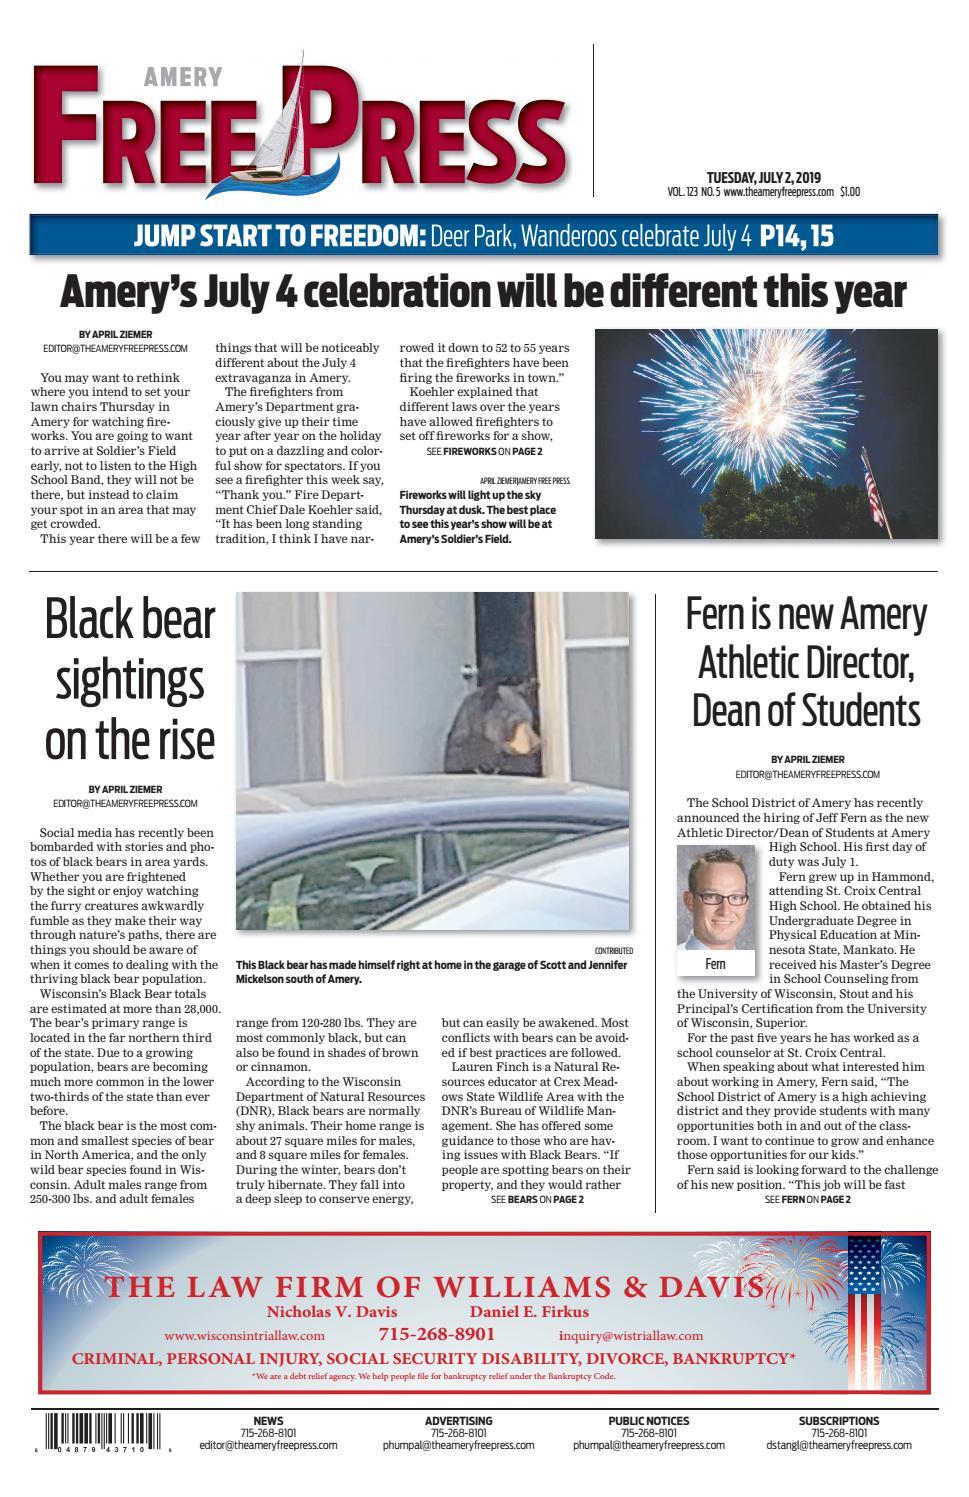 Amery Free Press July 2, 2019 by Amery Free Press - issuu